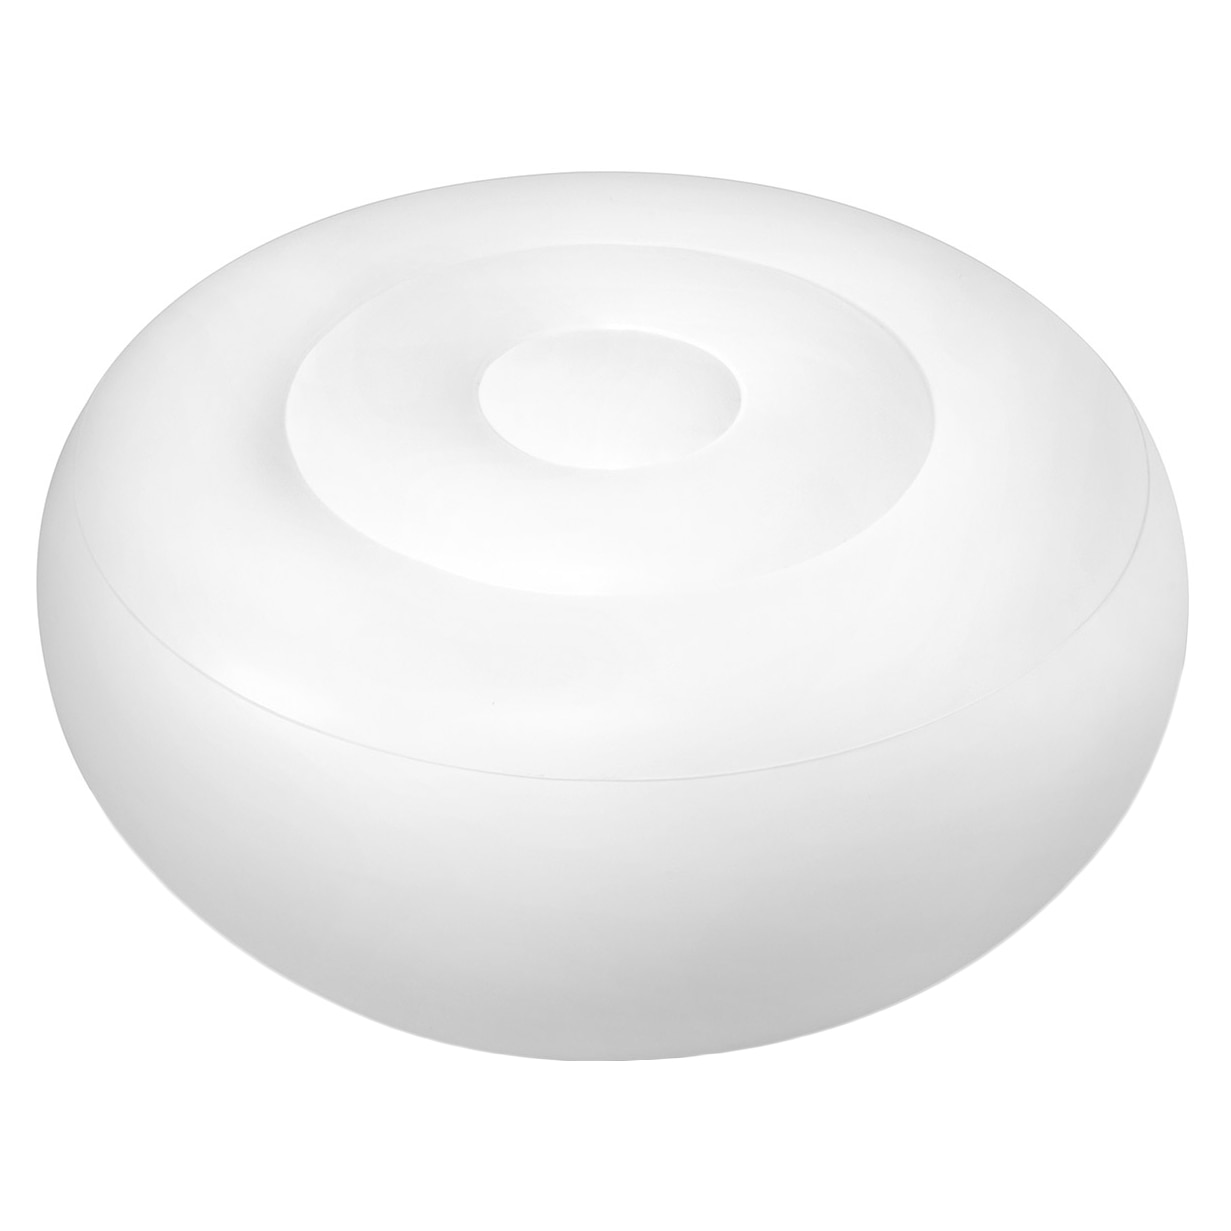 Fotografie Saltea gonflabila Intex Ottoman LED Light, White, 86cm